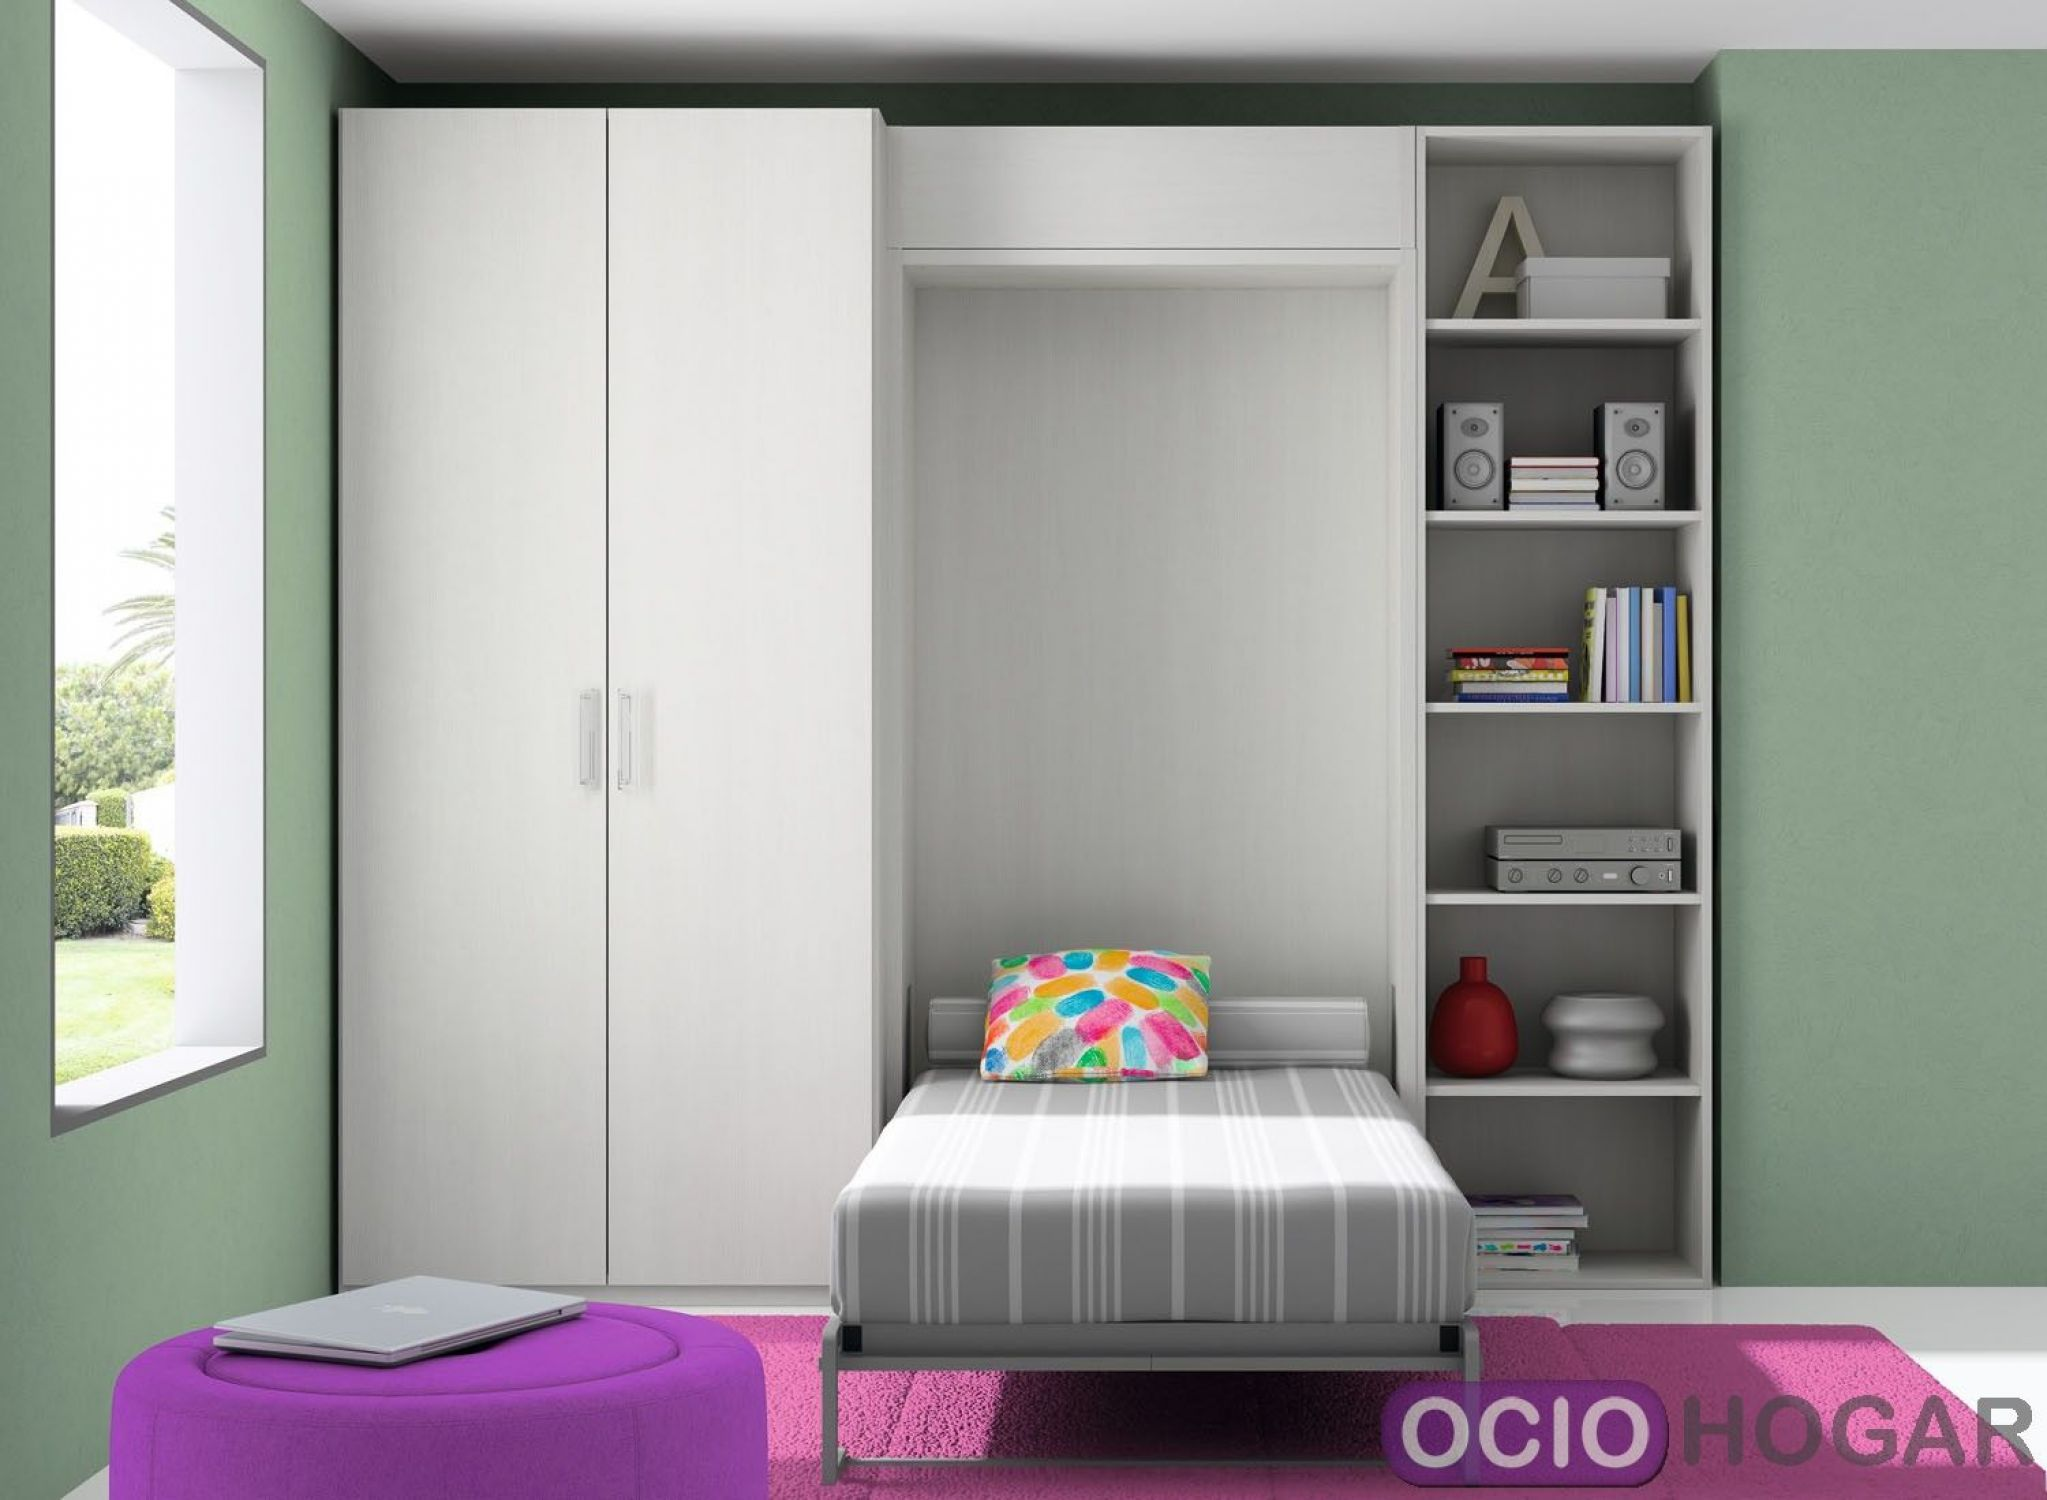 Dormitorio infantil closet de dissery muebles juveniles for Closet en madera para habitaciones